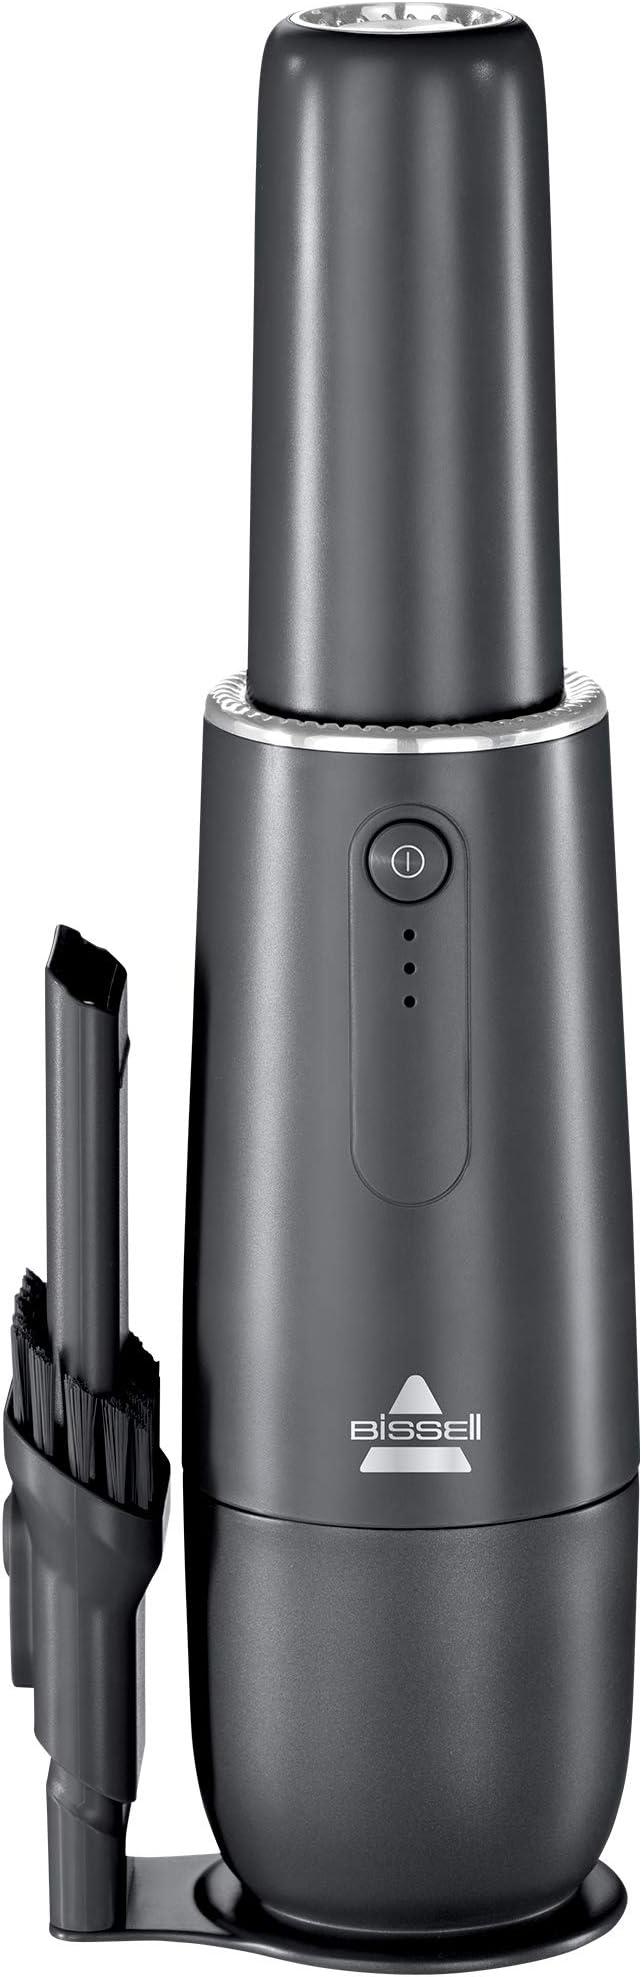 BISSELL AeroSlim Cordless Handheld Vacuum